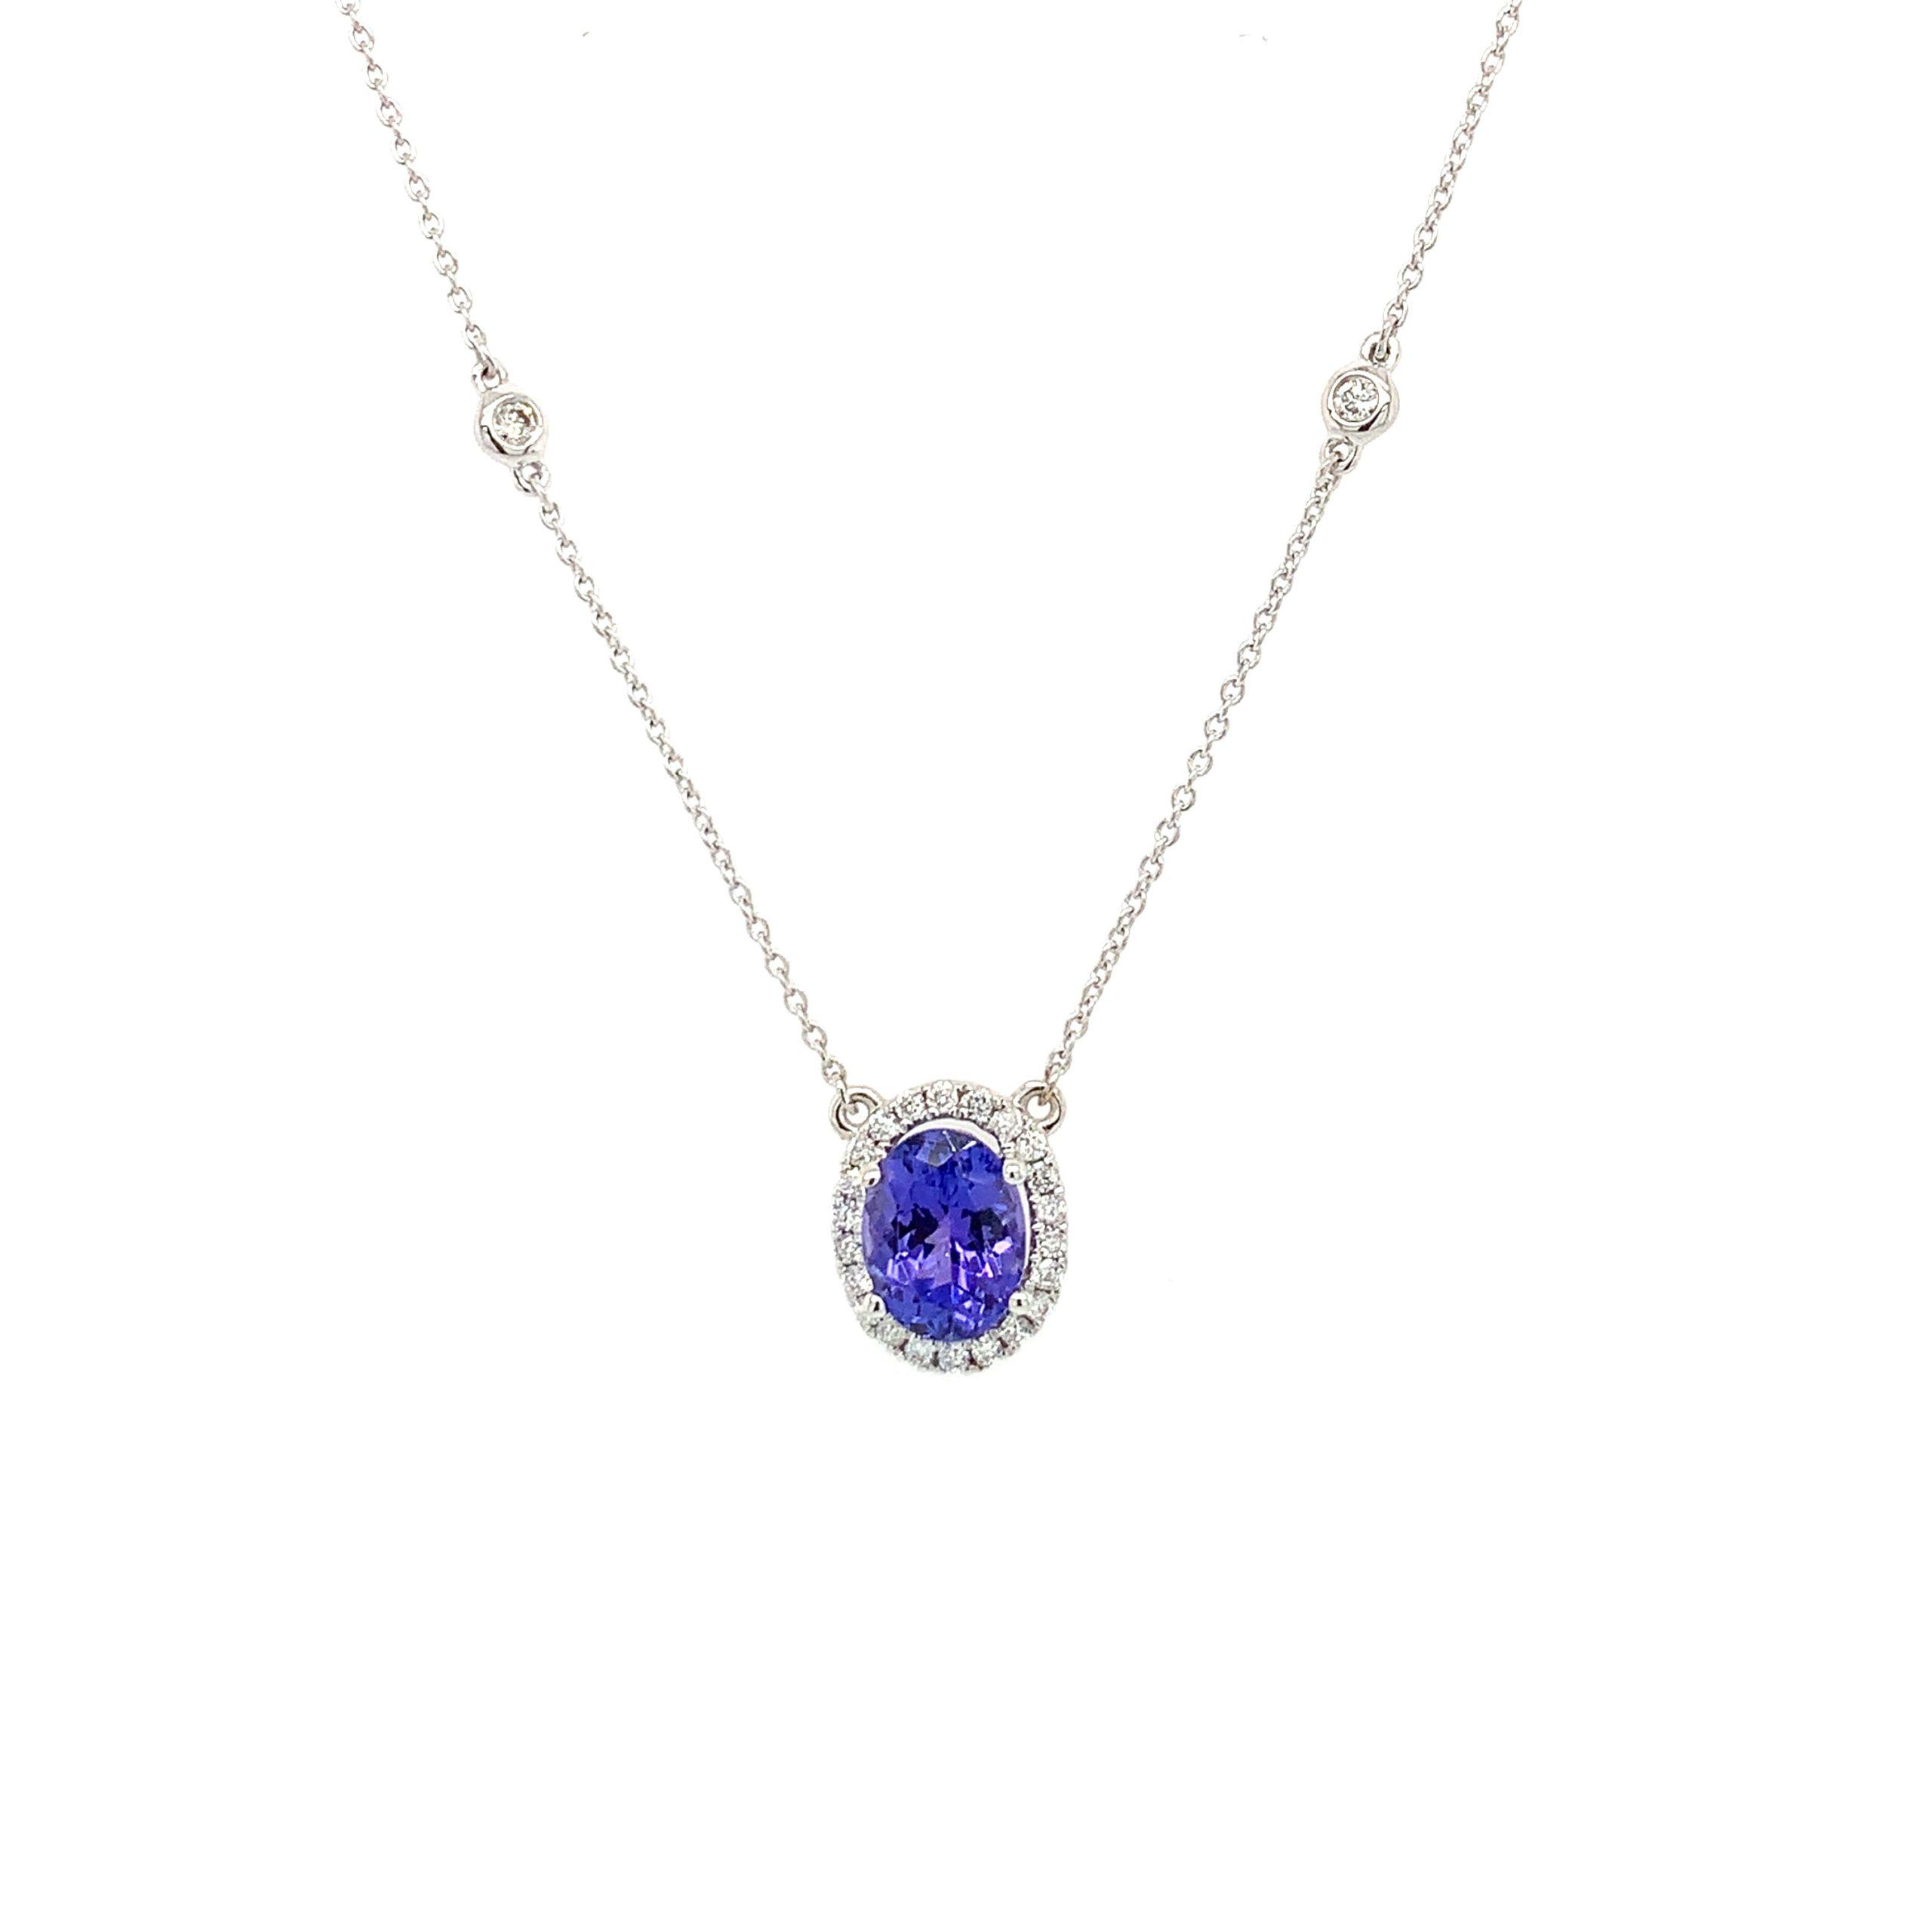 White Gold Tanzanite & Diamond Station Necklace